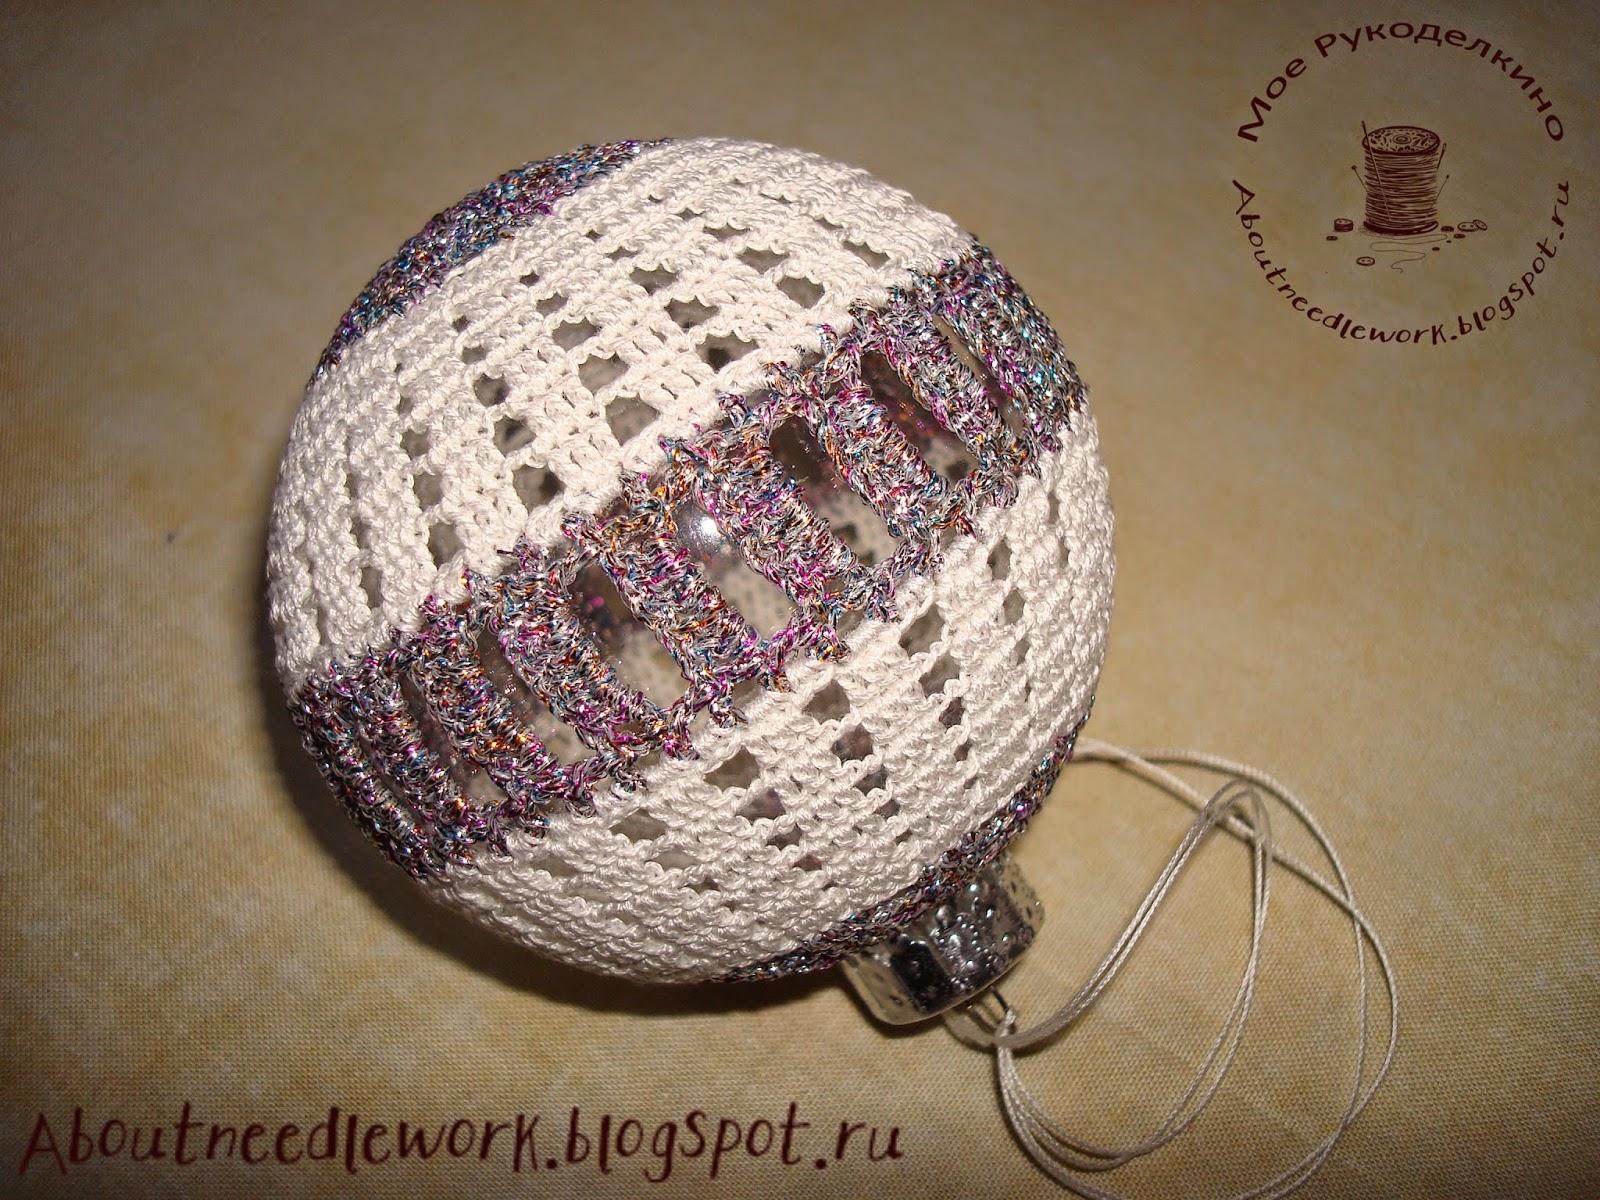 Елочный шар, обвязанный крючком